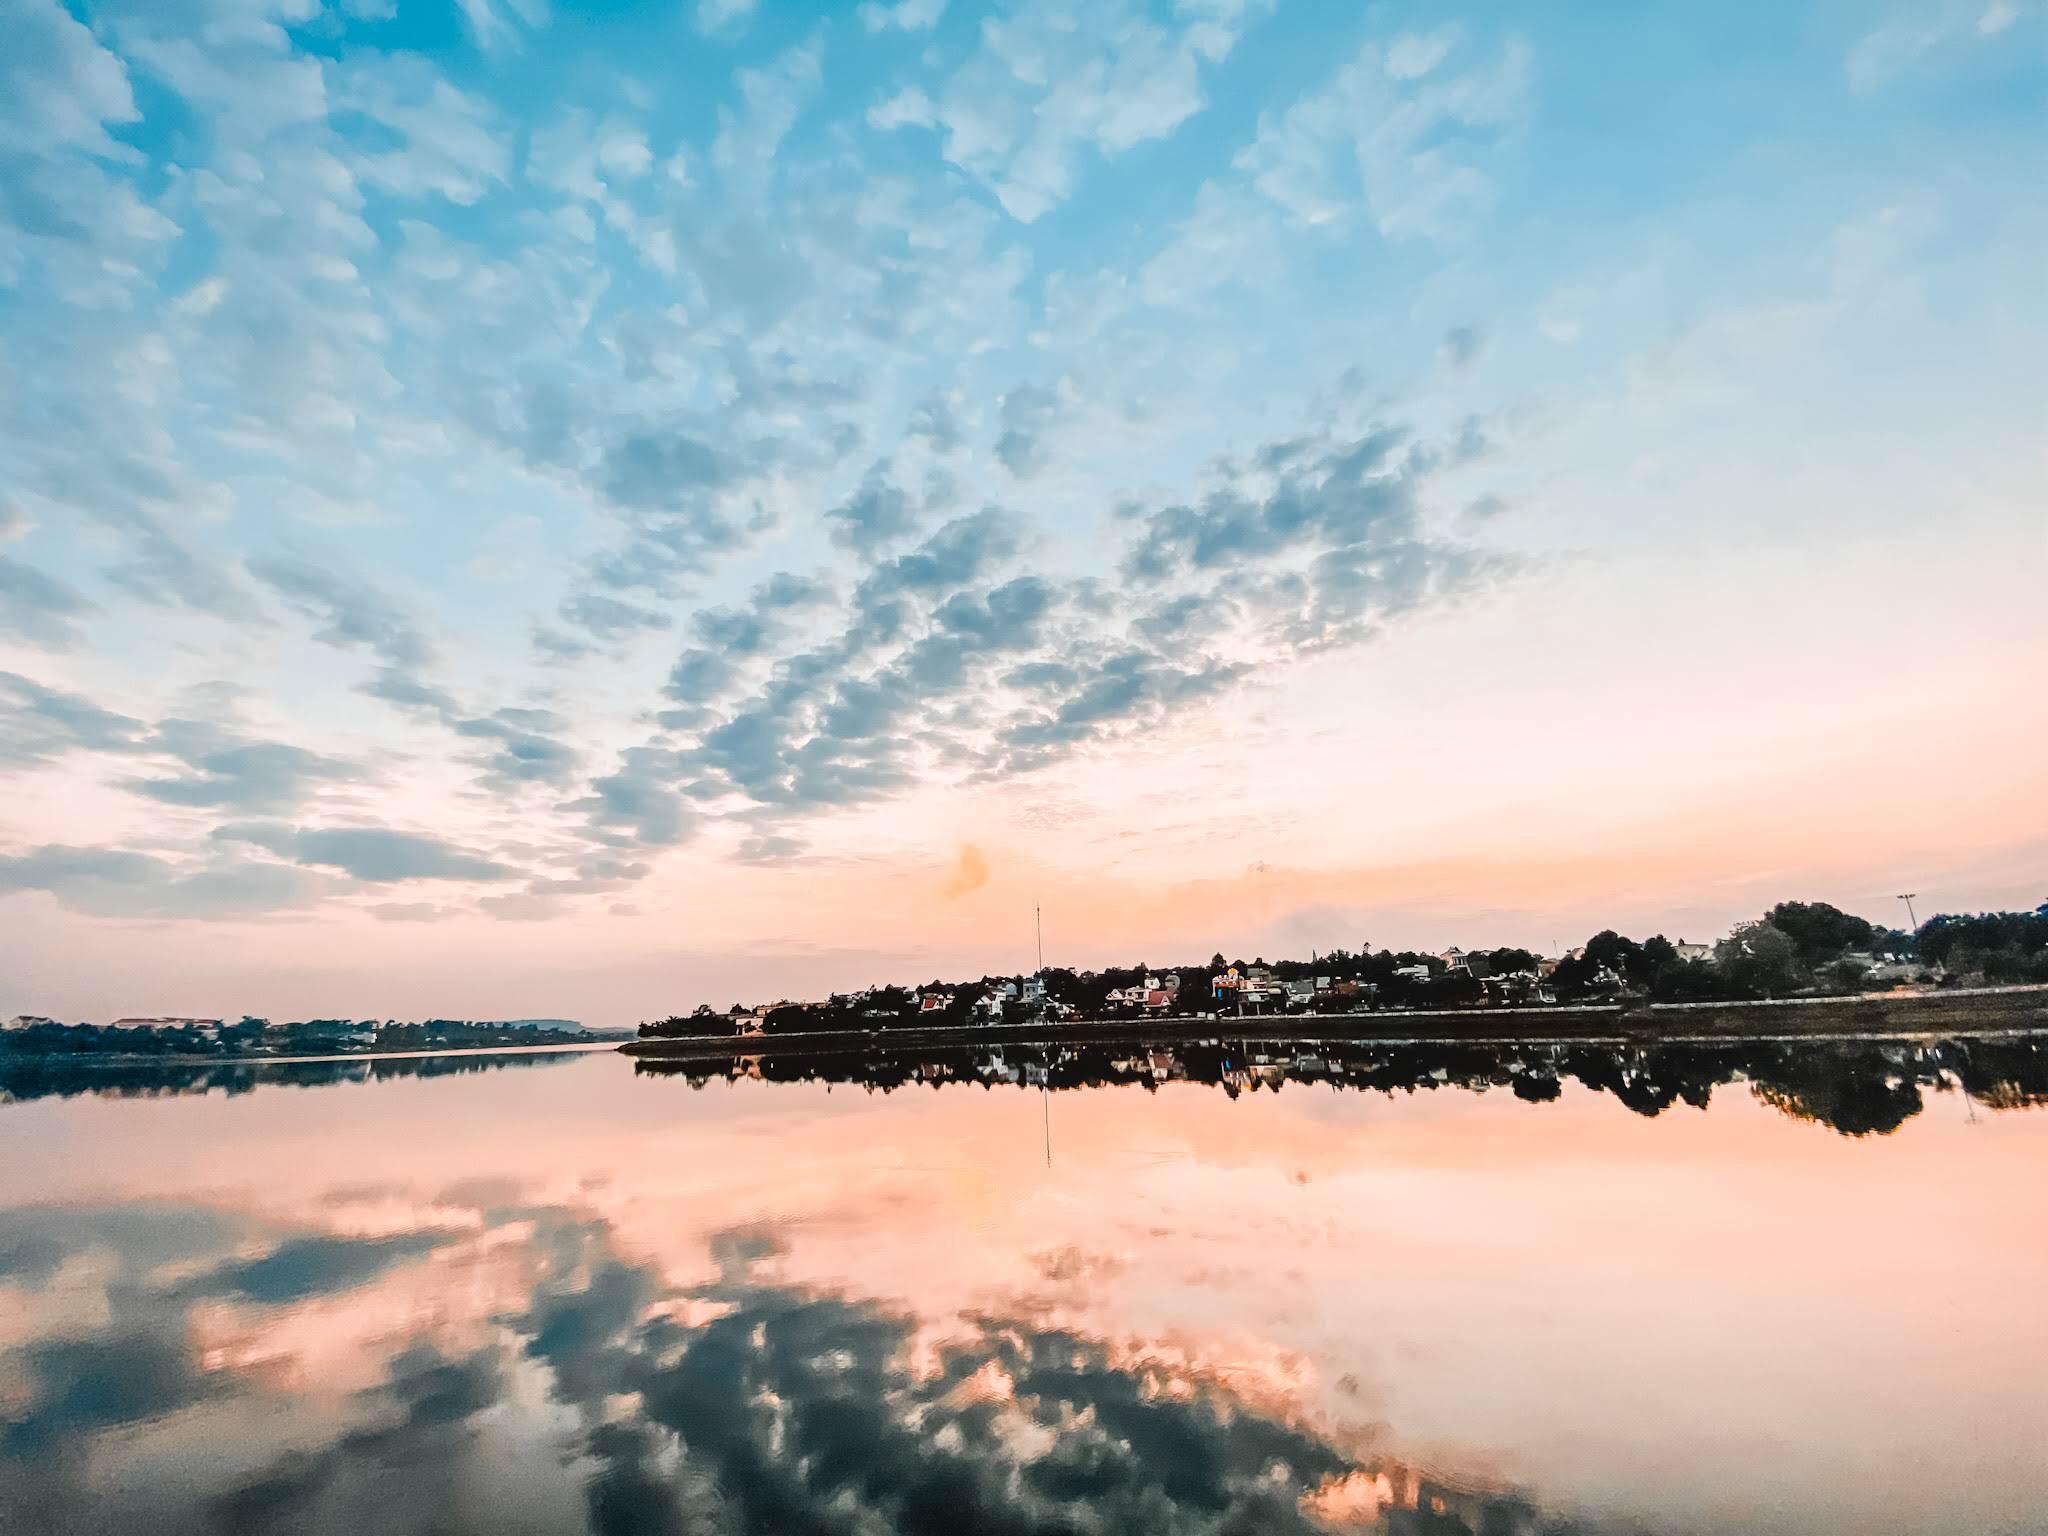 Hồ Tây – Trái Tim Của Đăk Mil